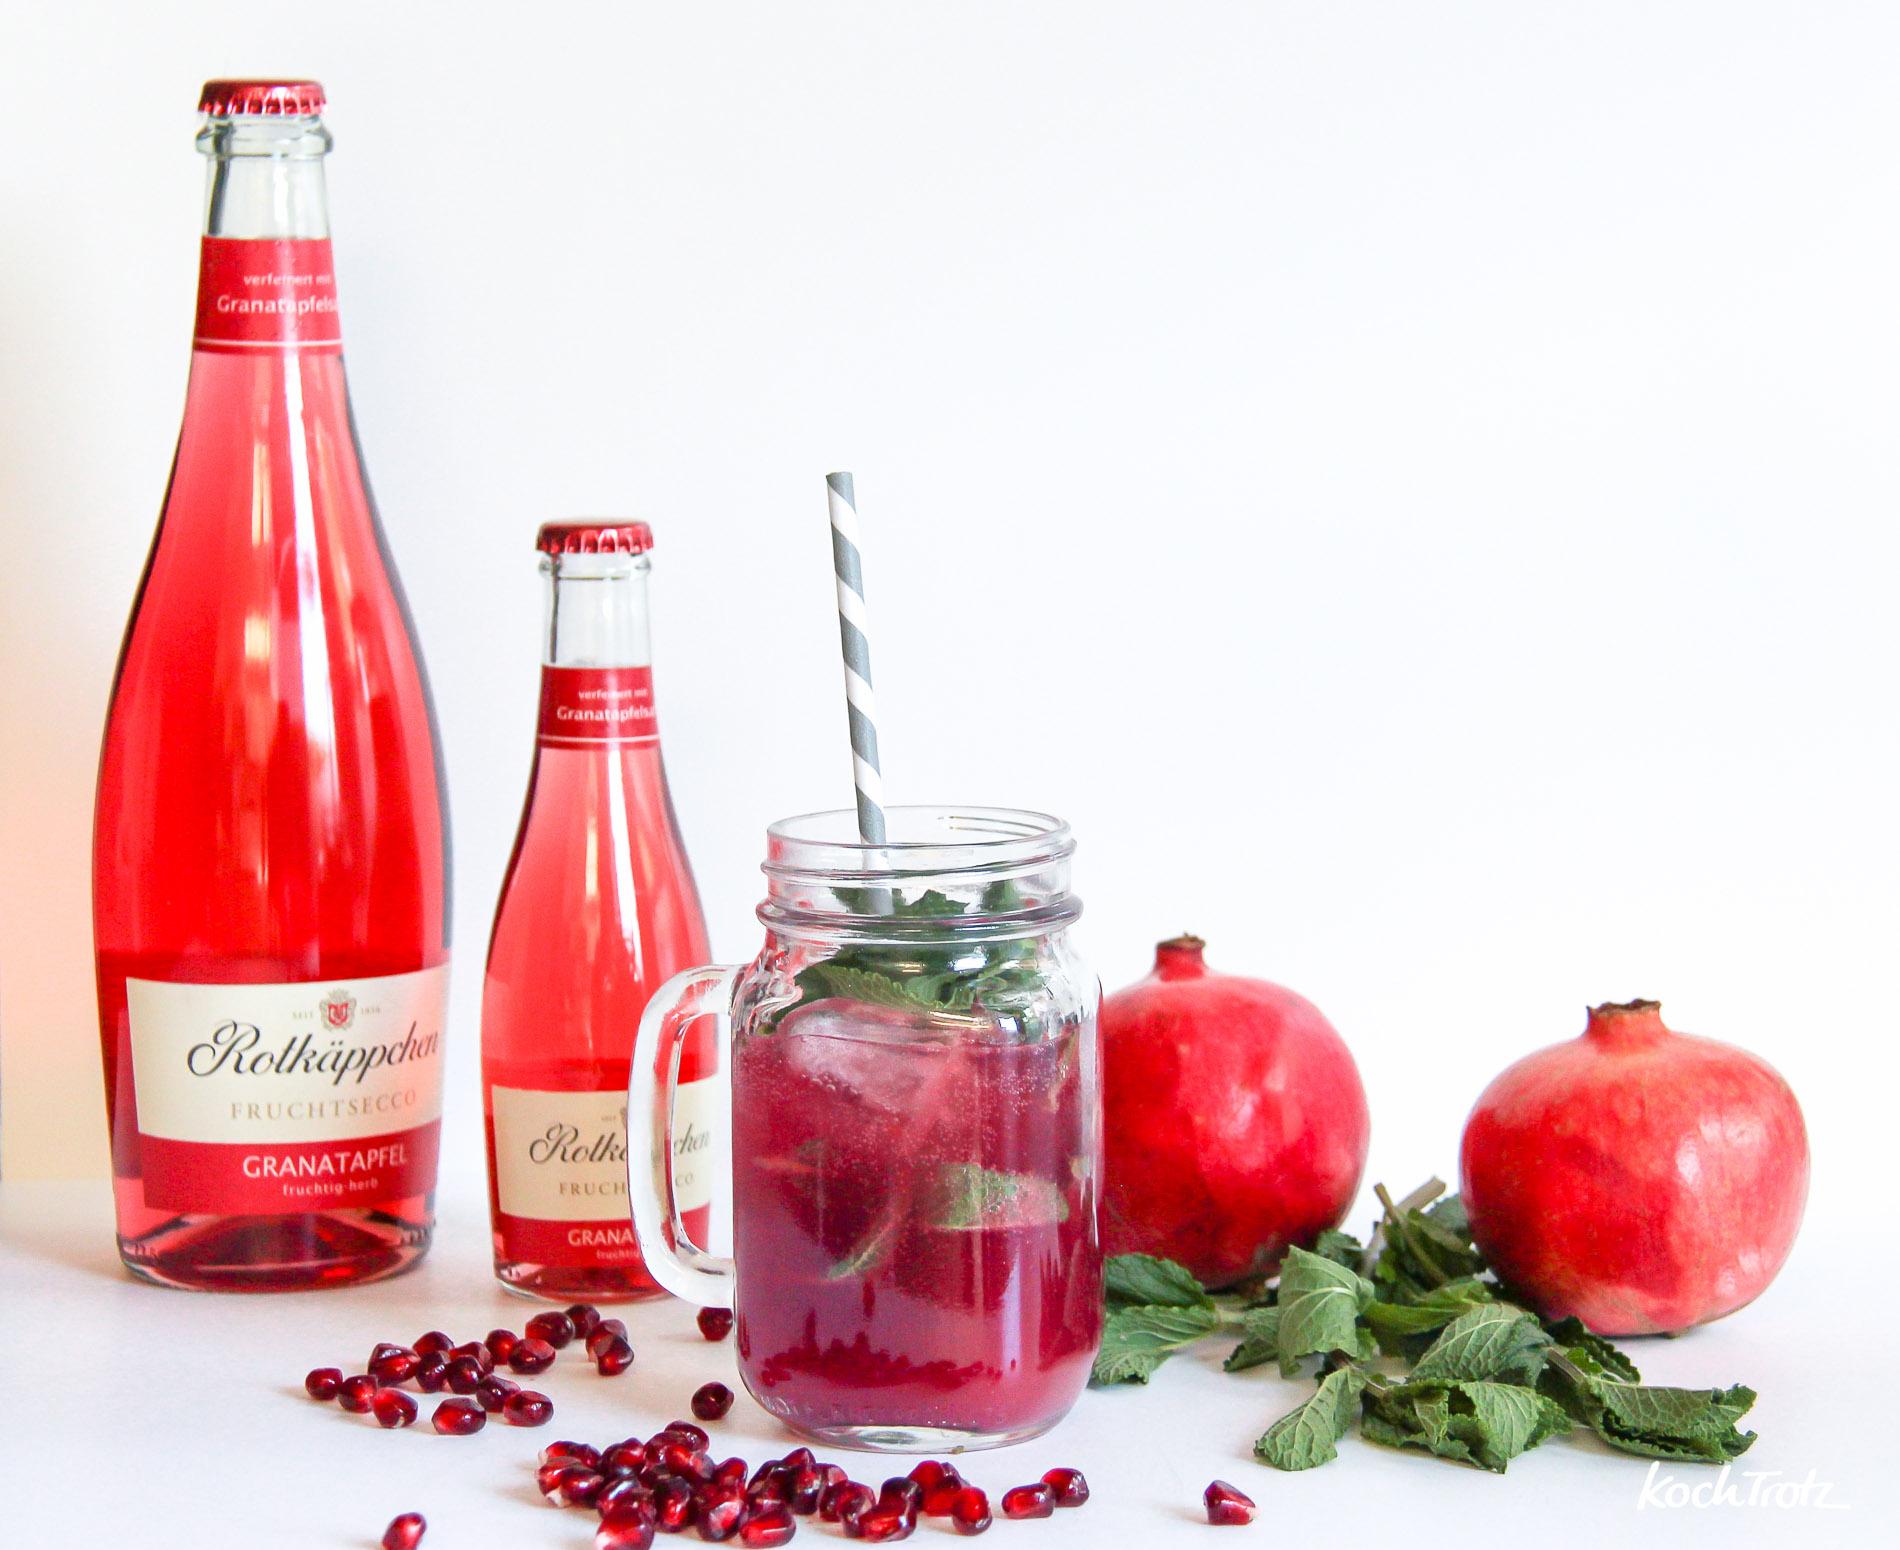 rotkaeppchen-frusecco-granatapfel-rhabarber-cooler-1